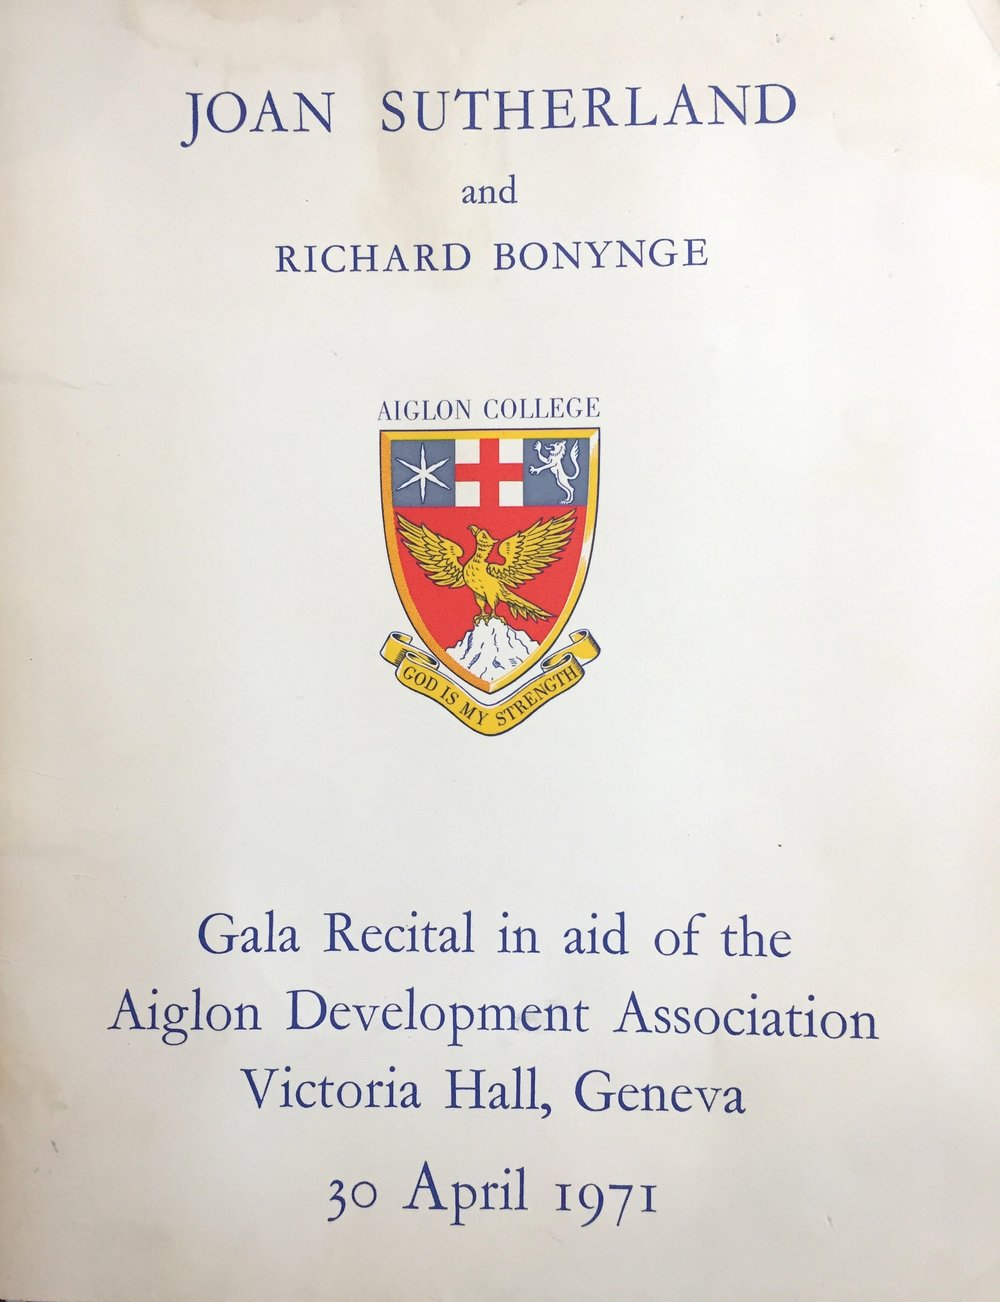 The 1971 Sutherland-Bonynge Geneva Gala Rccital program cover.